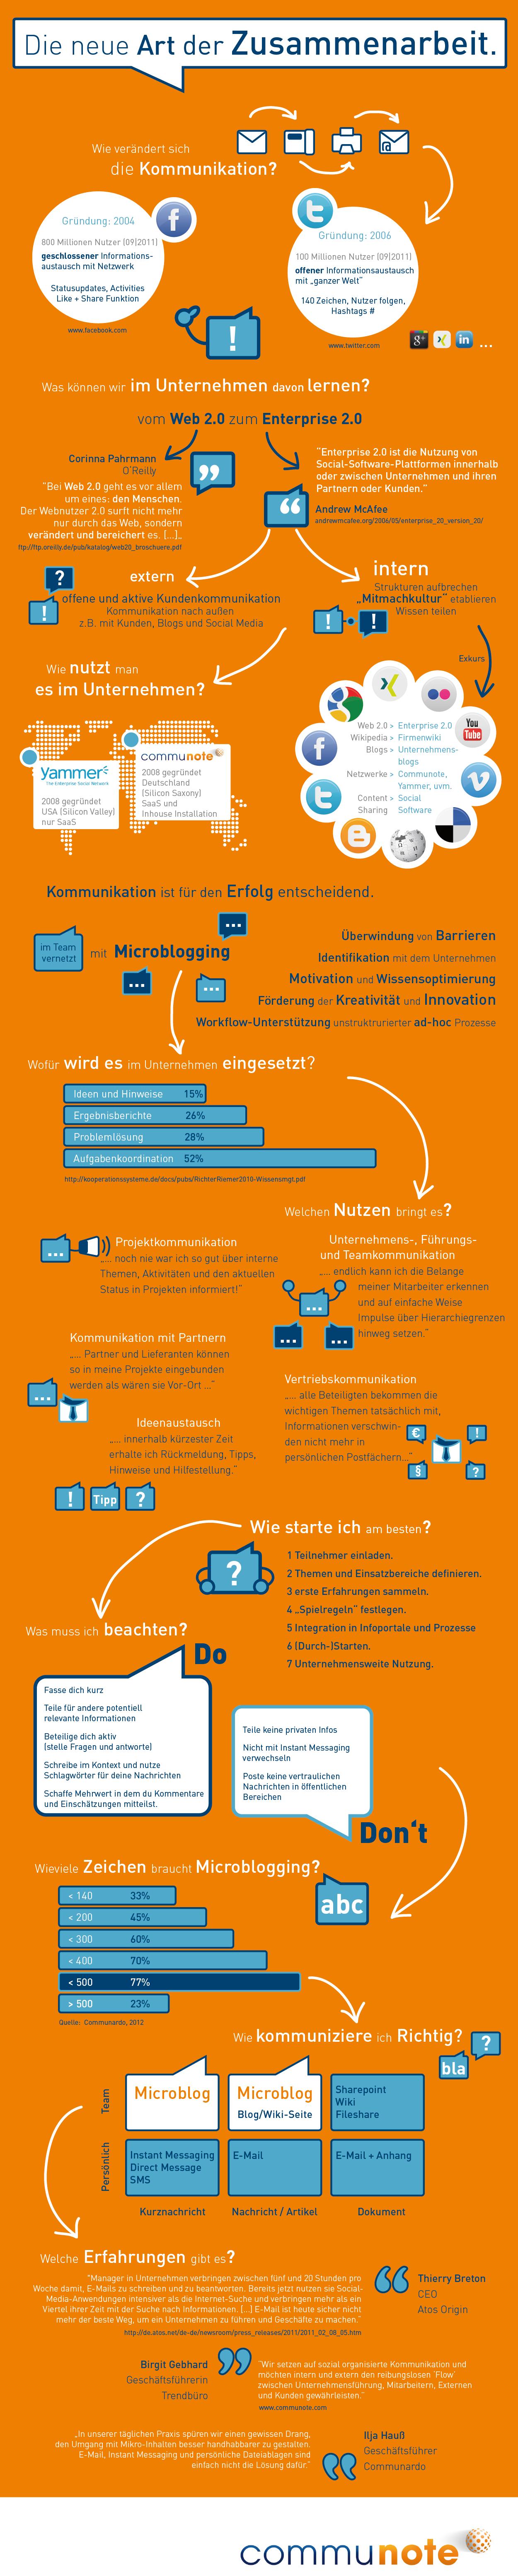 communote-infografik_de